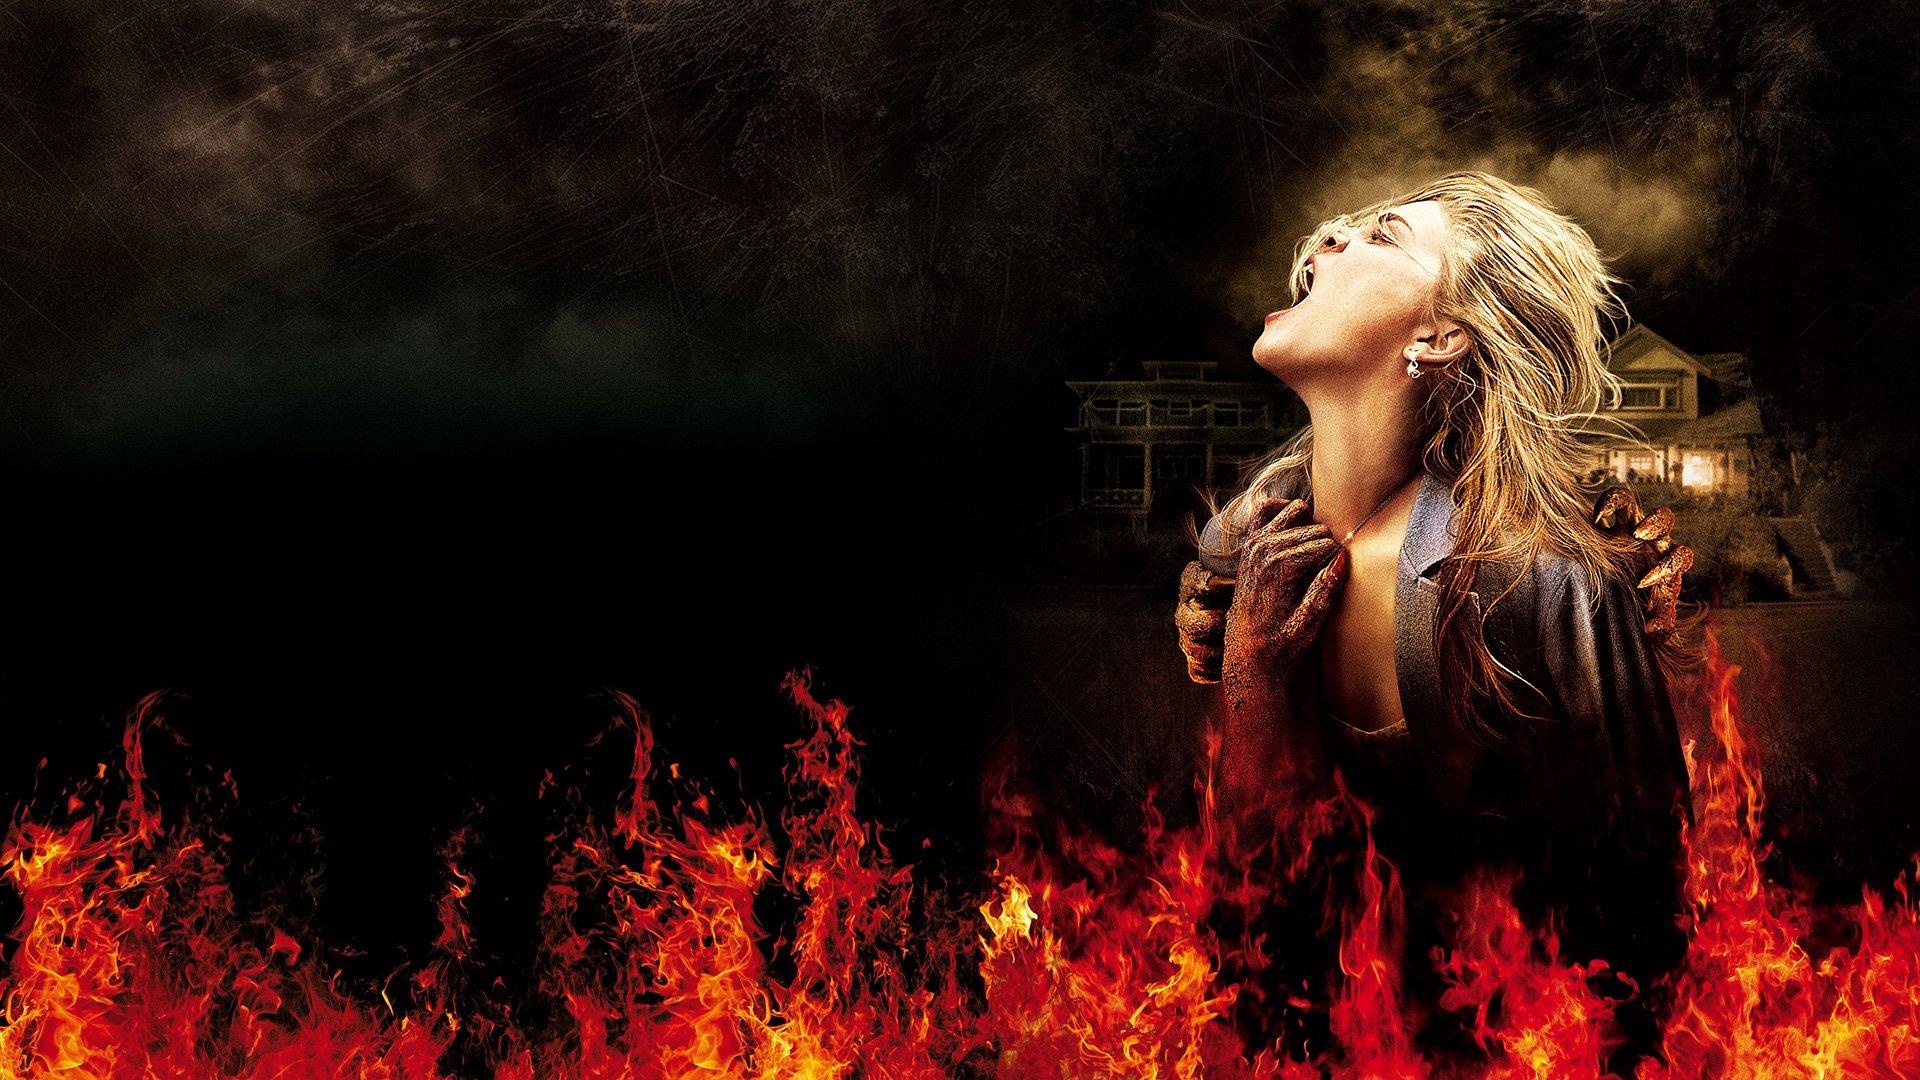 Bakgrundsbilder Id - - Drag Me To Hell , HD Wallpaper & Backgrounds